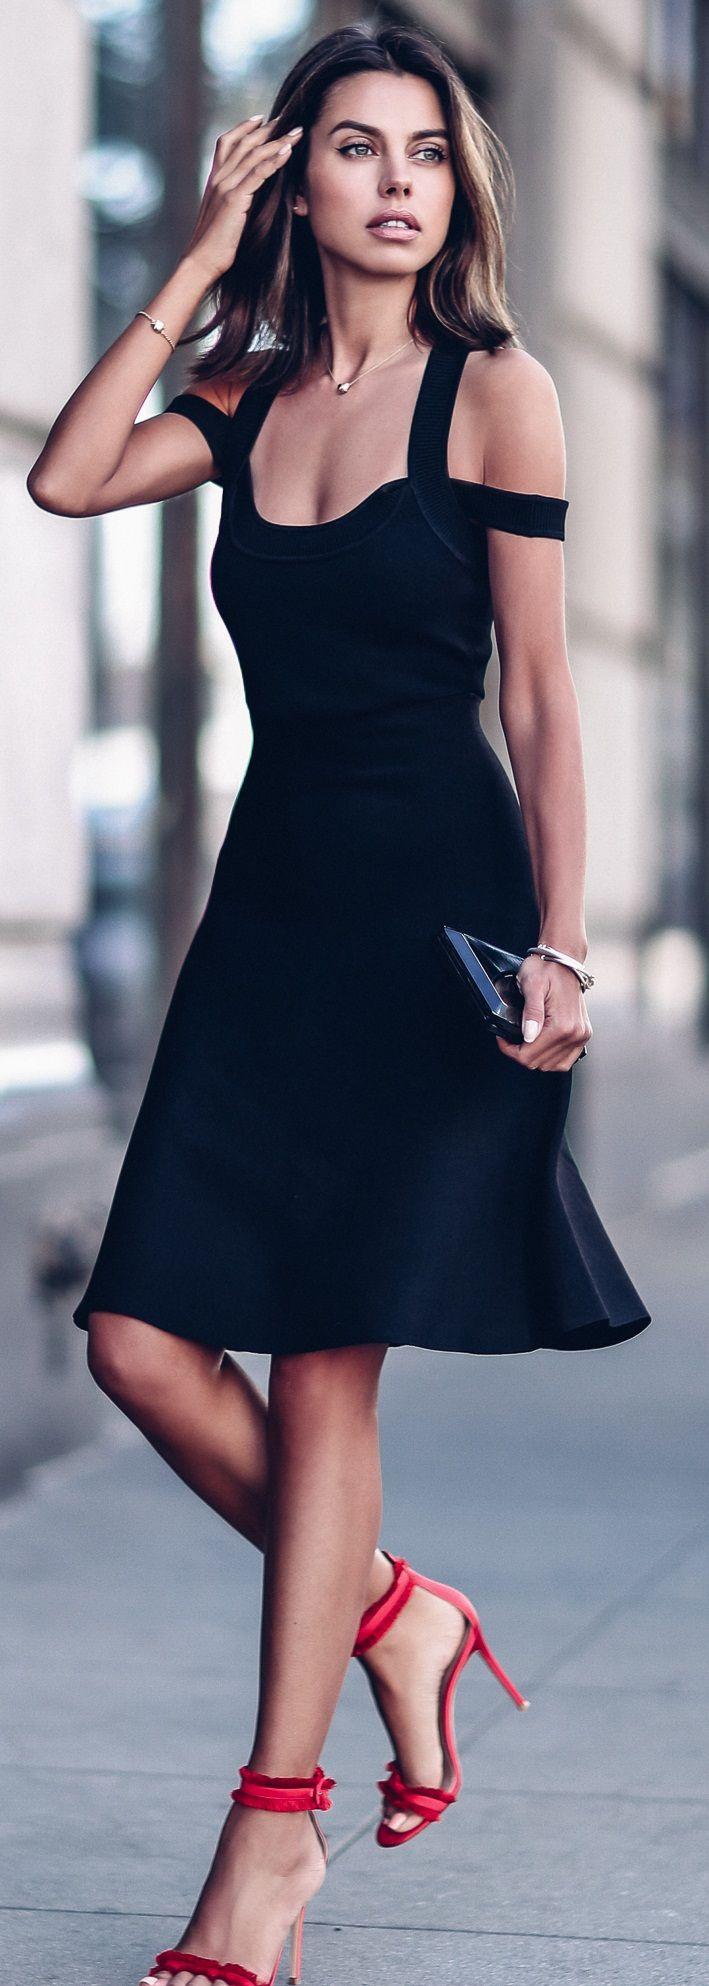 Black Off Shoulder Dress Red Strappy Heels Fashion Style Street Style Women [ 1986 x 709 Pixel ]